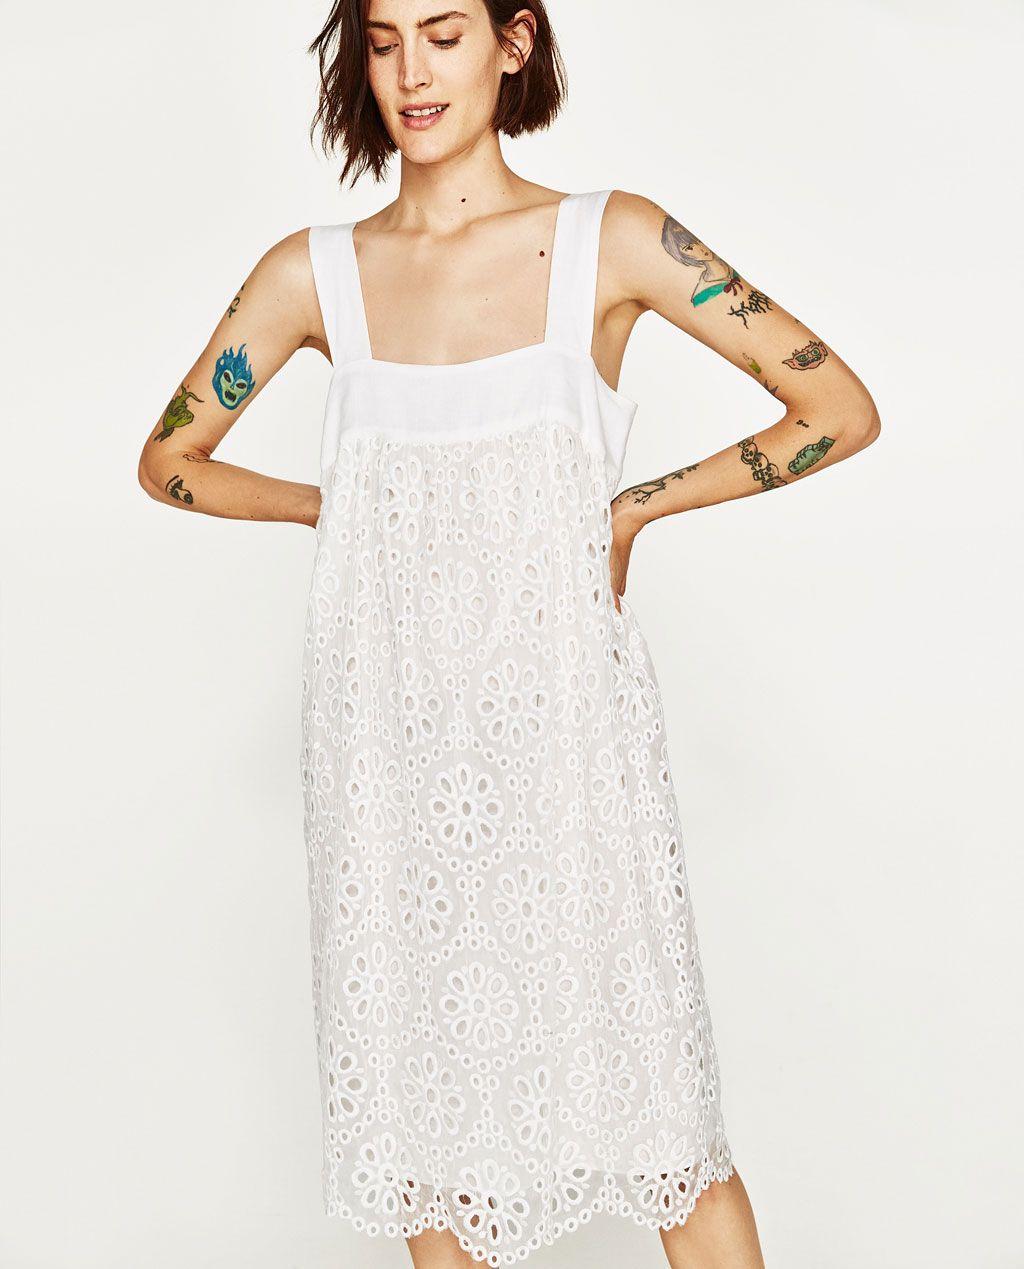 EMBROIDERED EYELET MIDI DRESS | Dresses | Pinterest